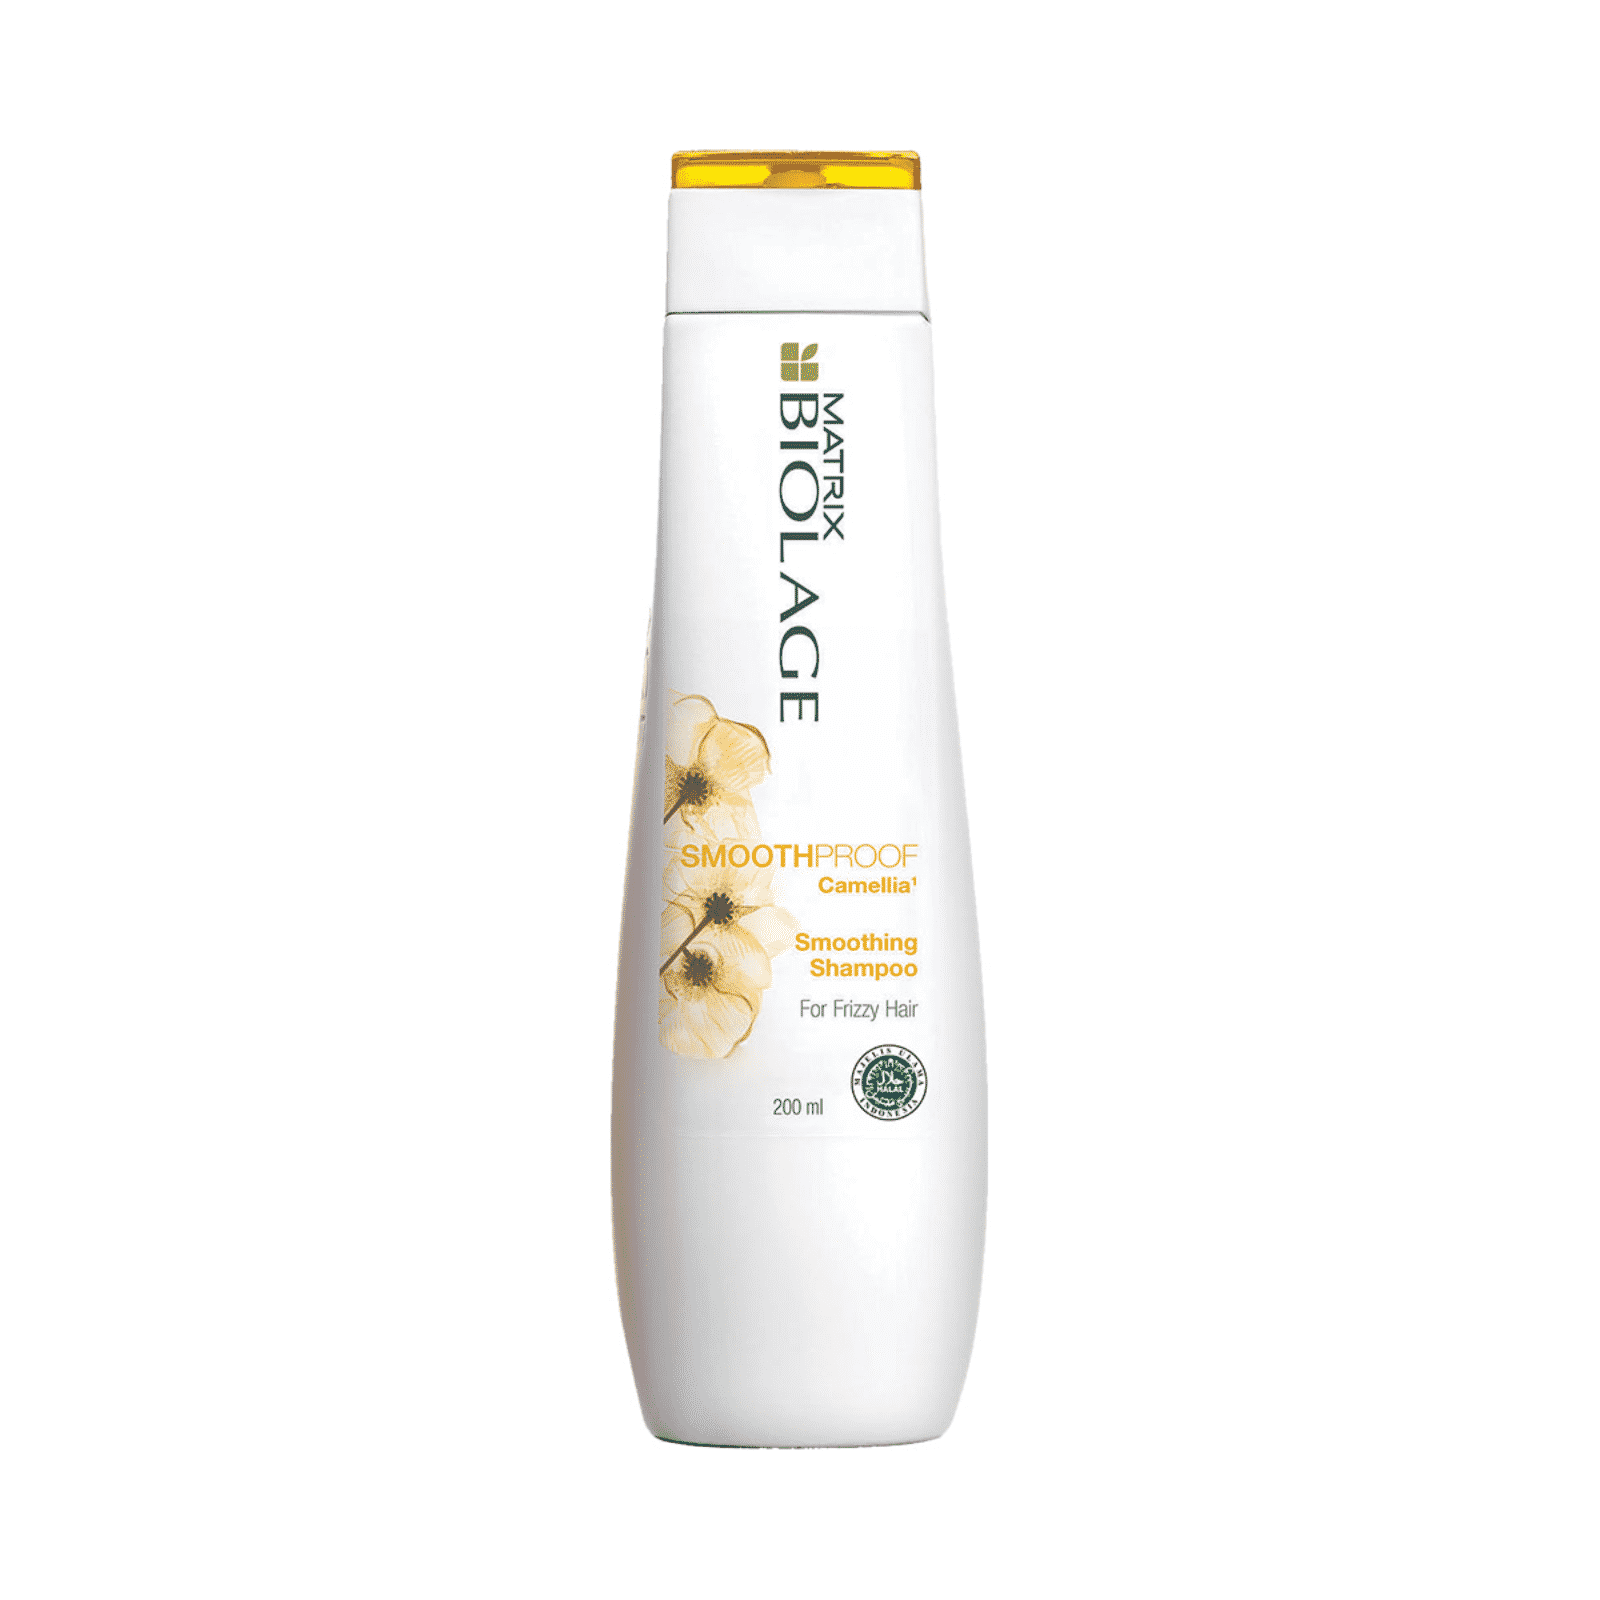 Biolage-Smooth-Proof-Shampoo-Matrix